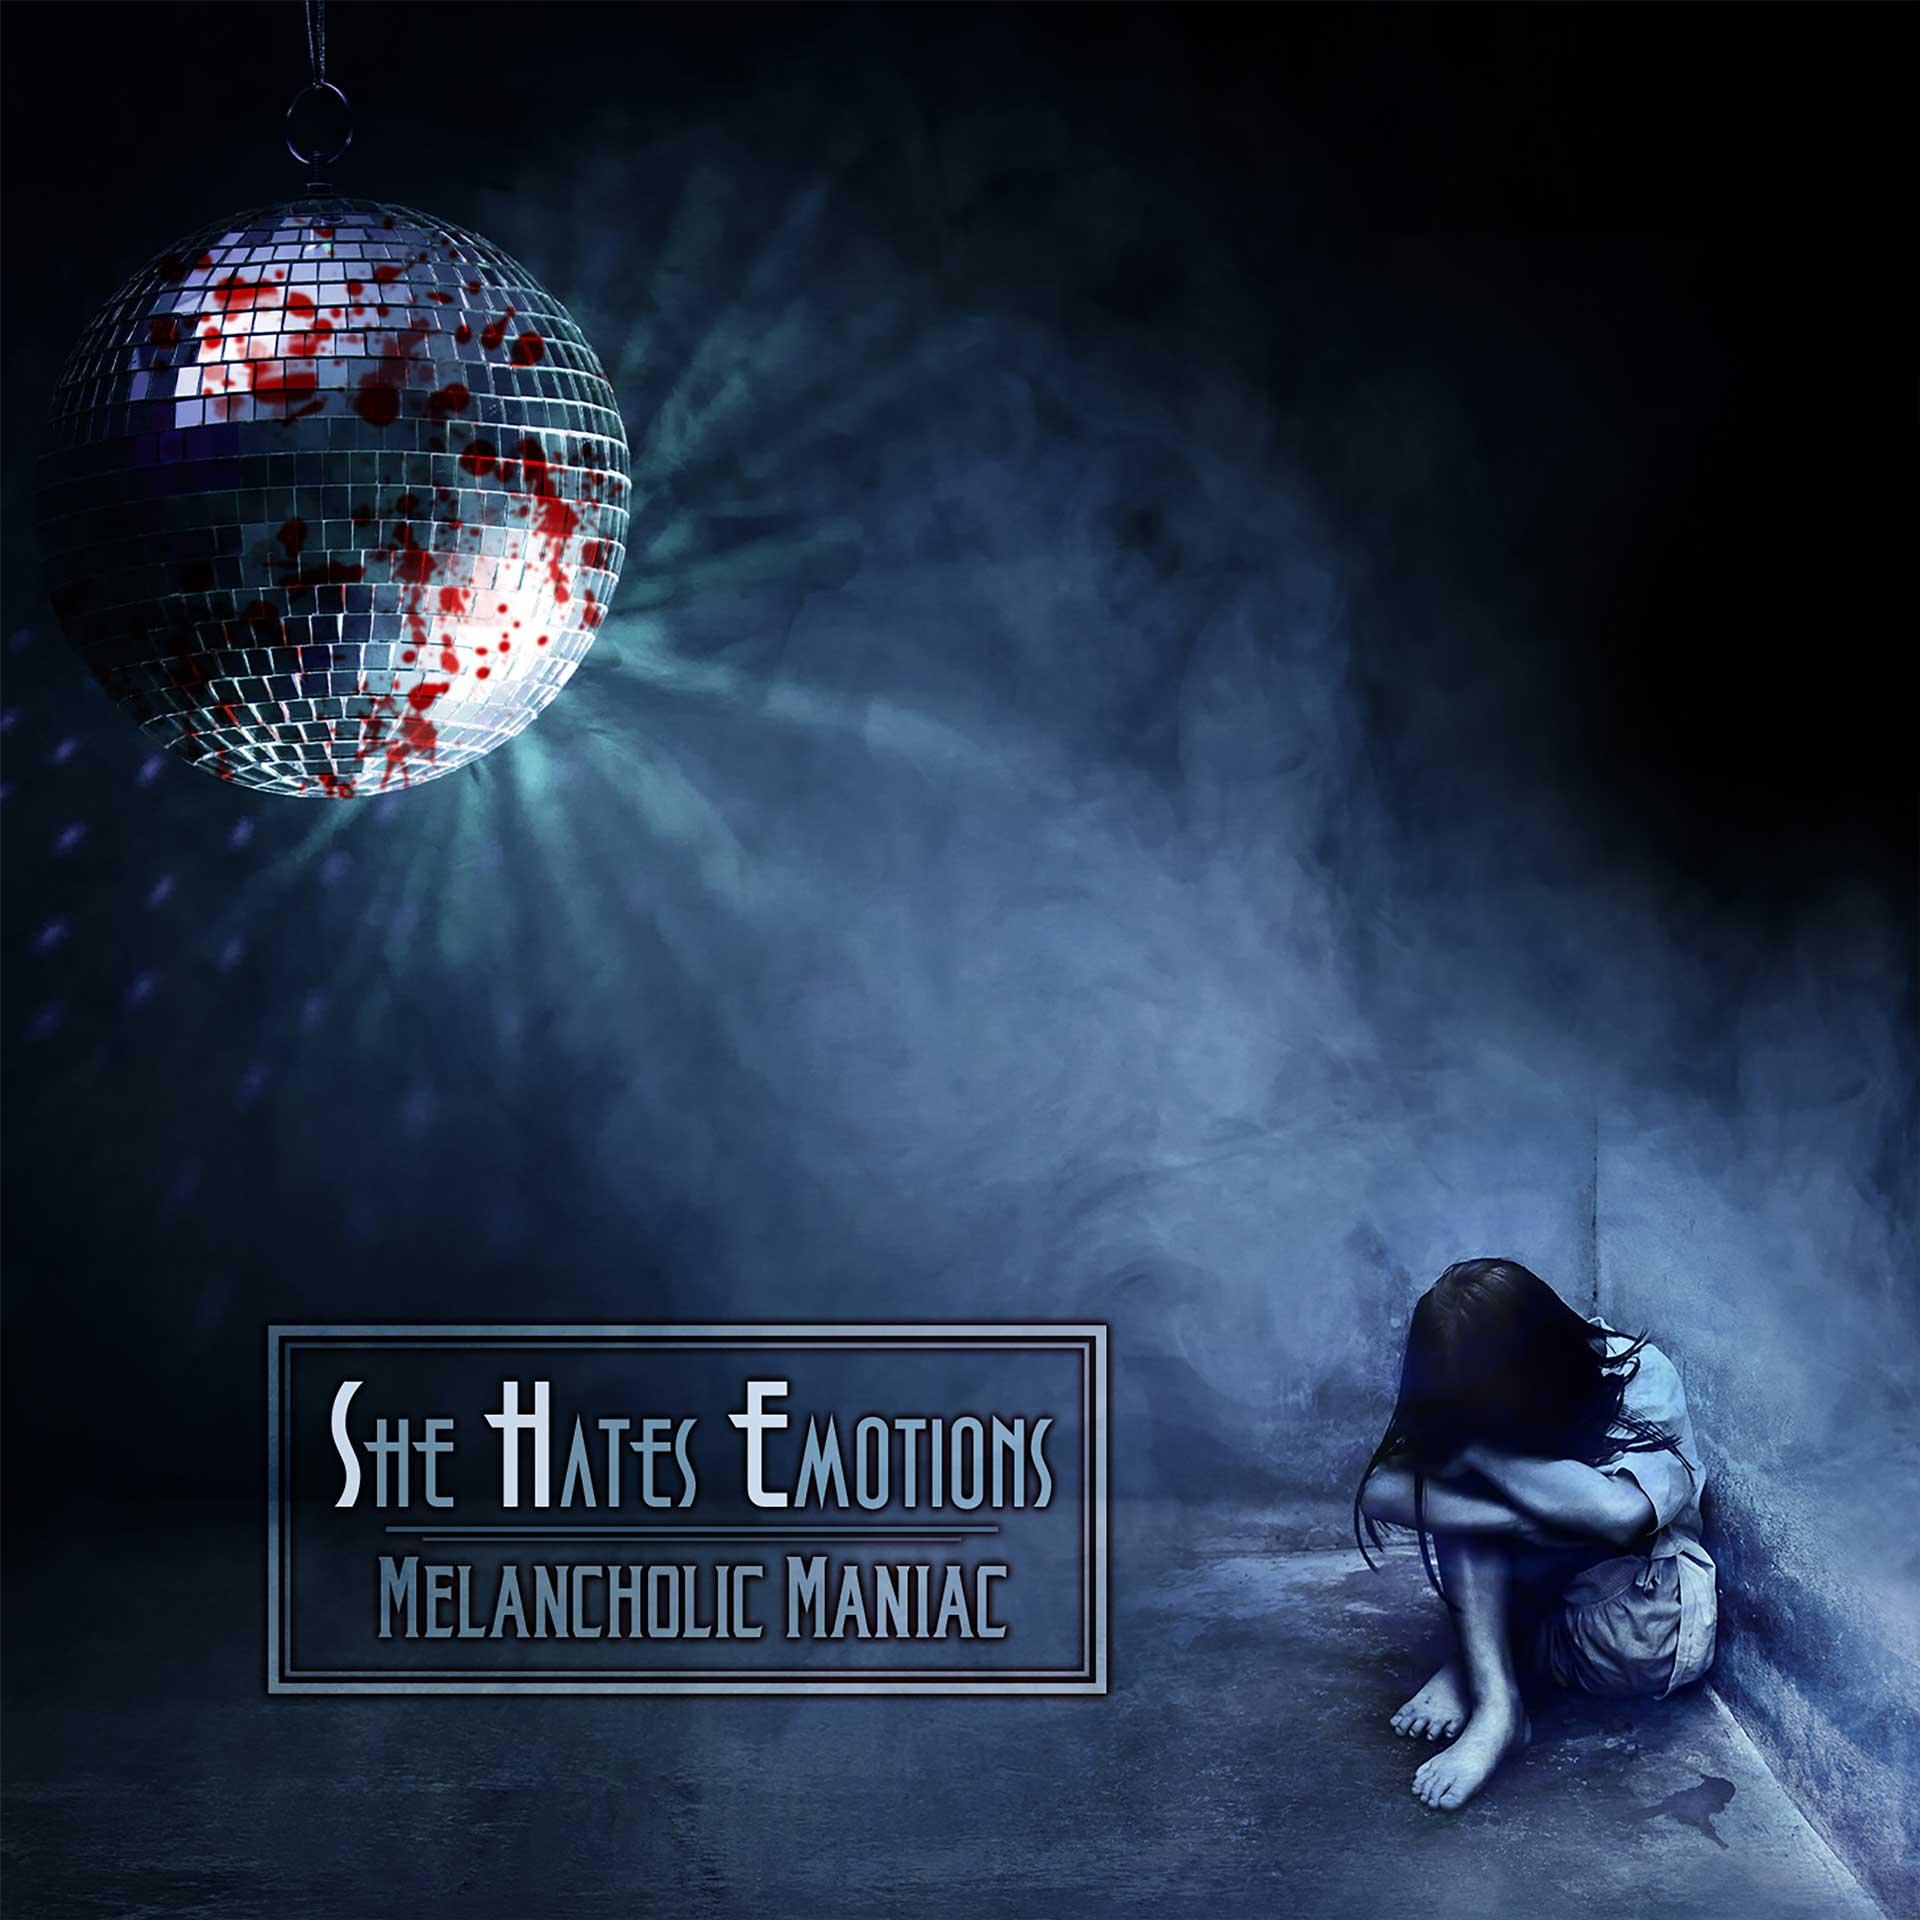 She Hates Emotions - Melancholic Maniac